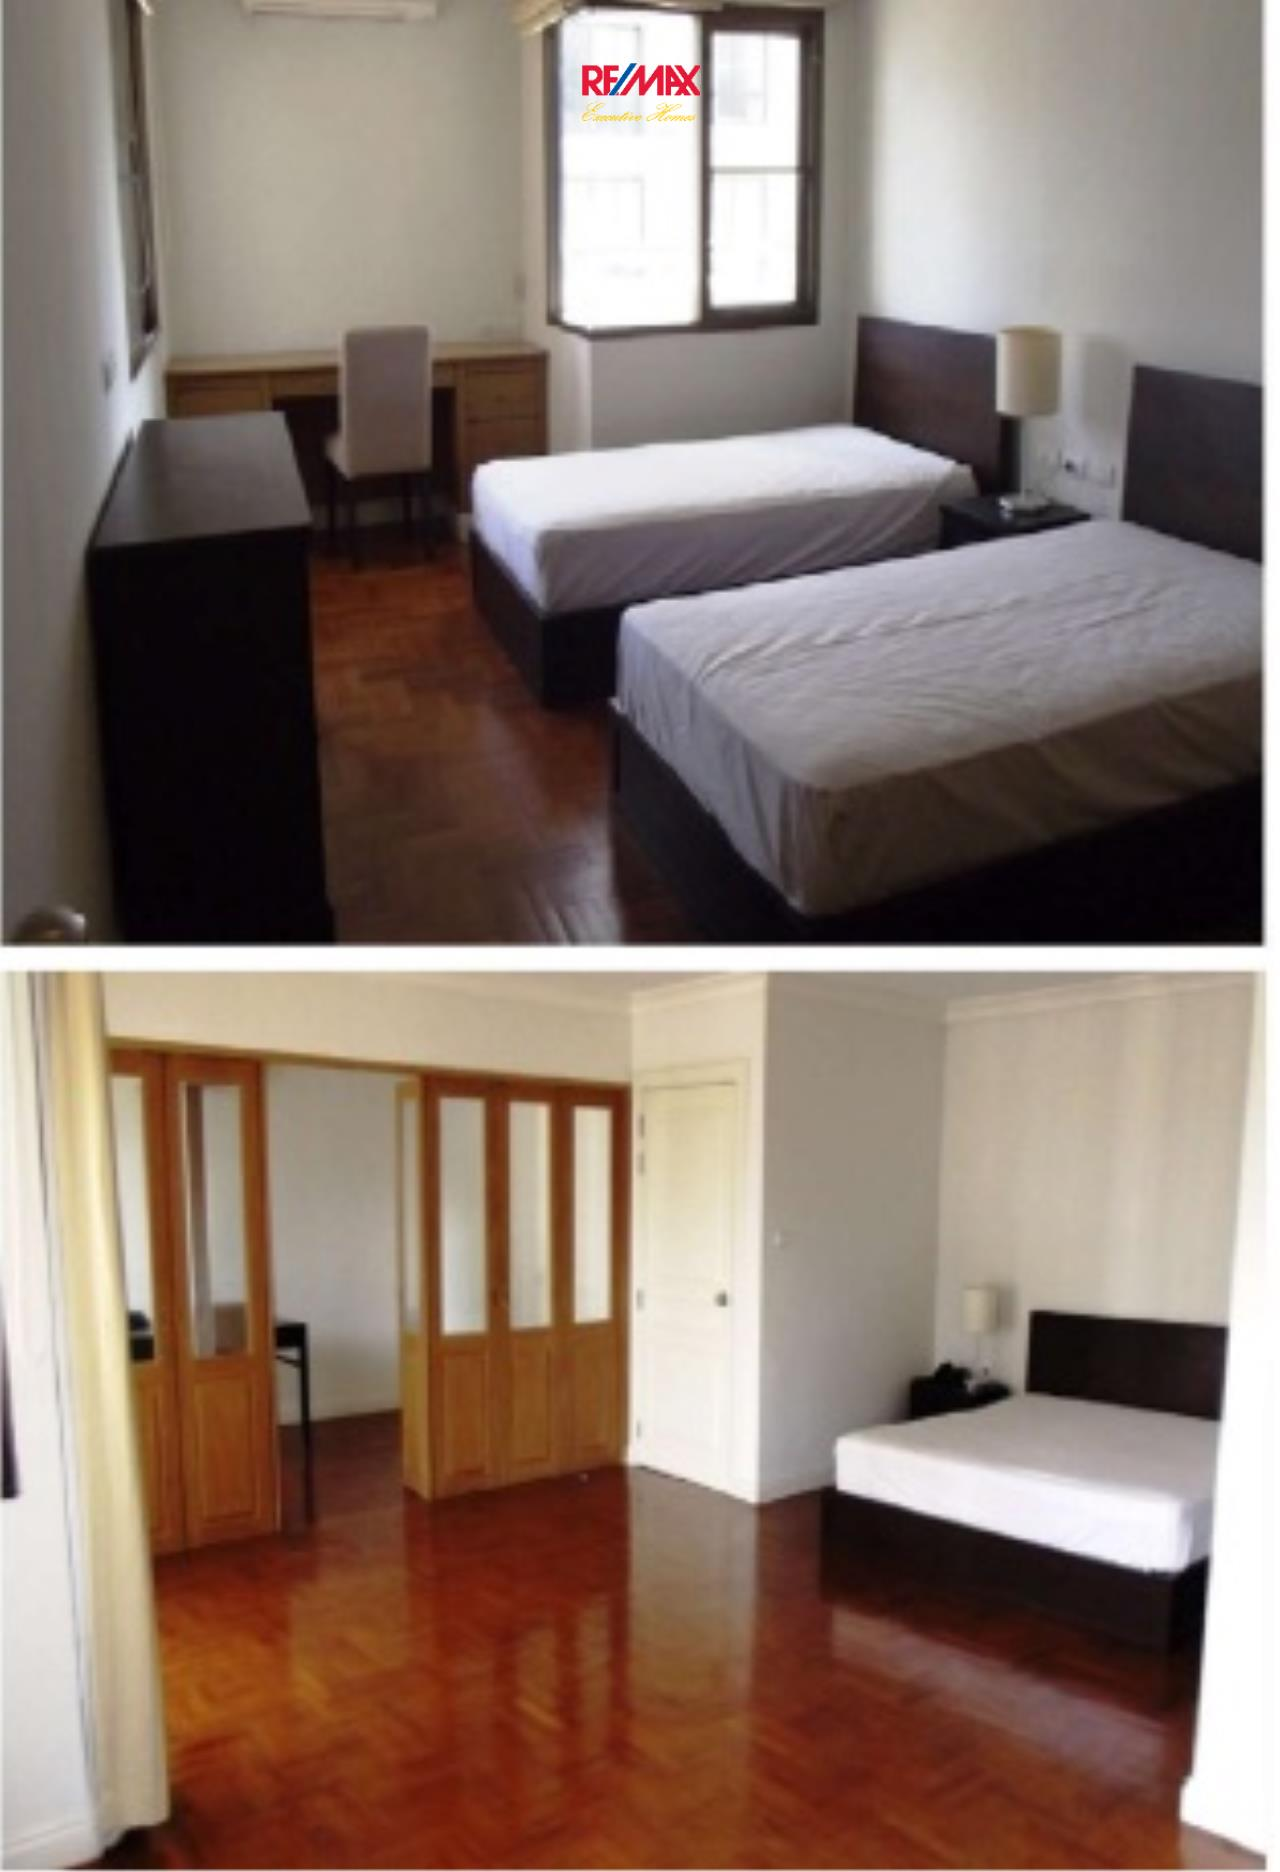 RE/MAX Executive Homes Agency's Large 3 Bedroom Duplex for Rent Baan Sawasdee 2